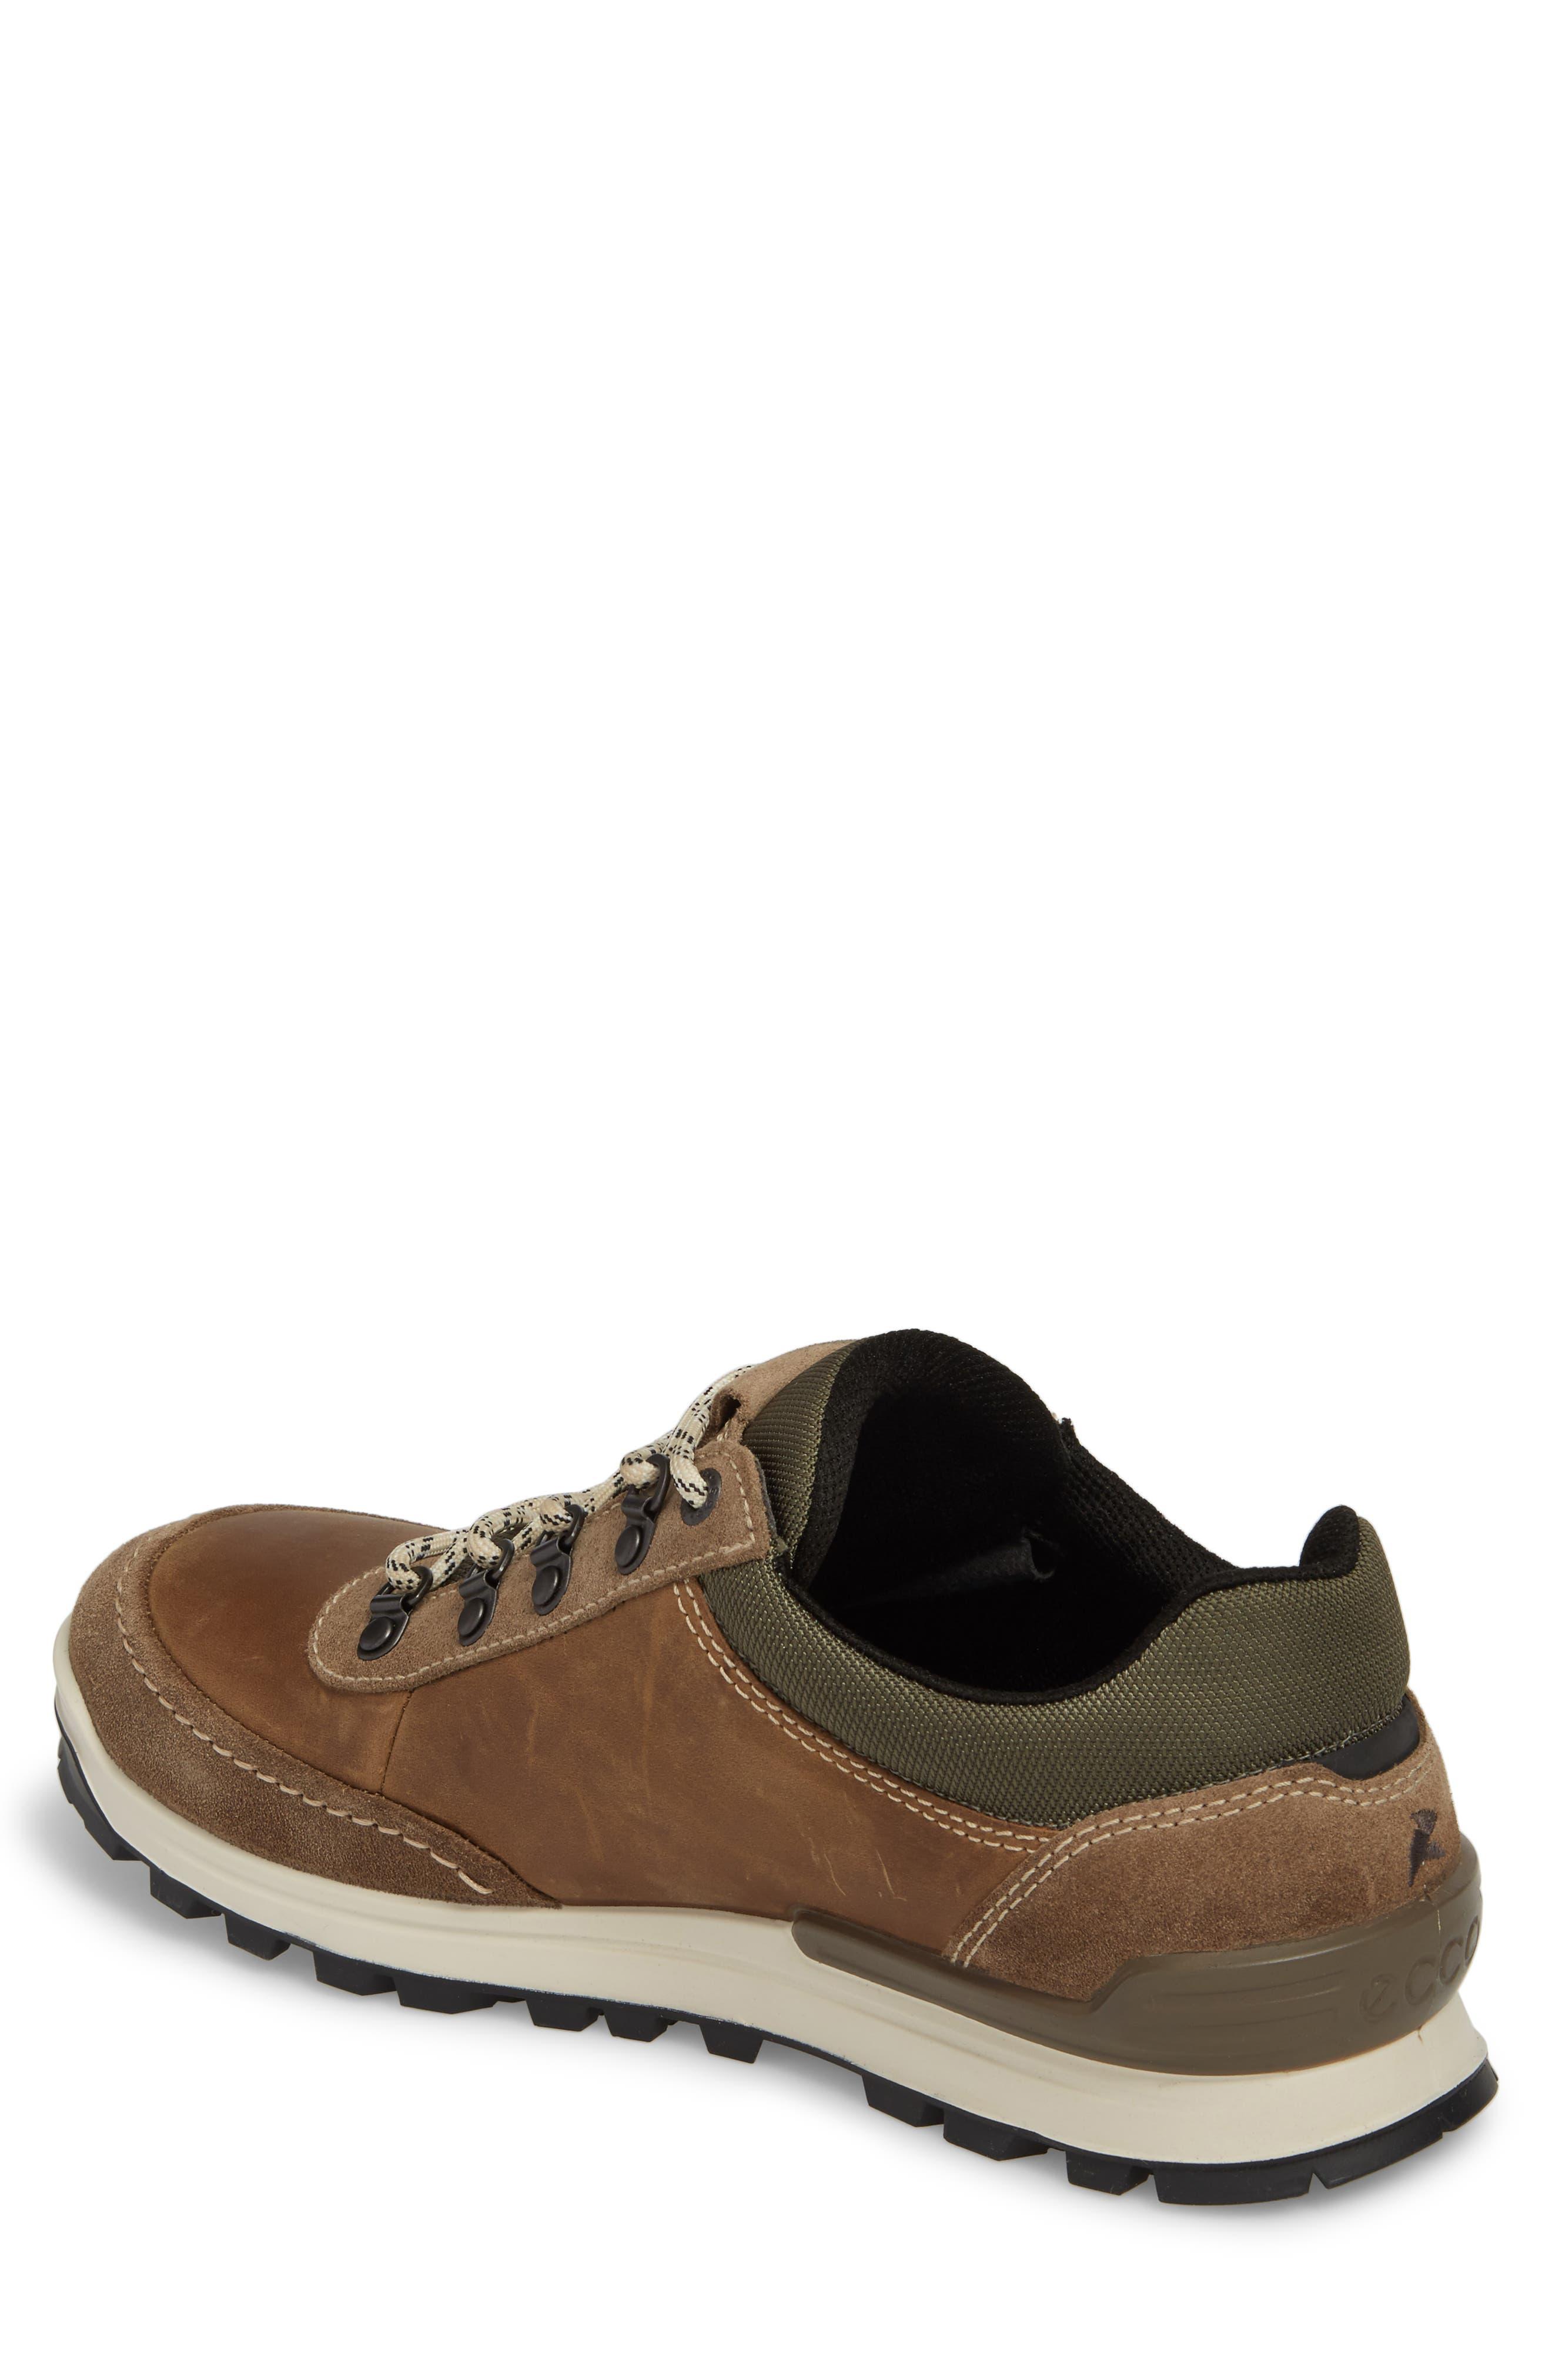 Oregon Sneaker,                             Alternate thumbnail 2, color,                             Brown Leather